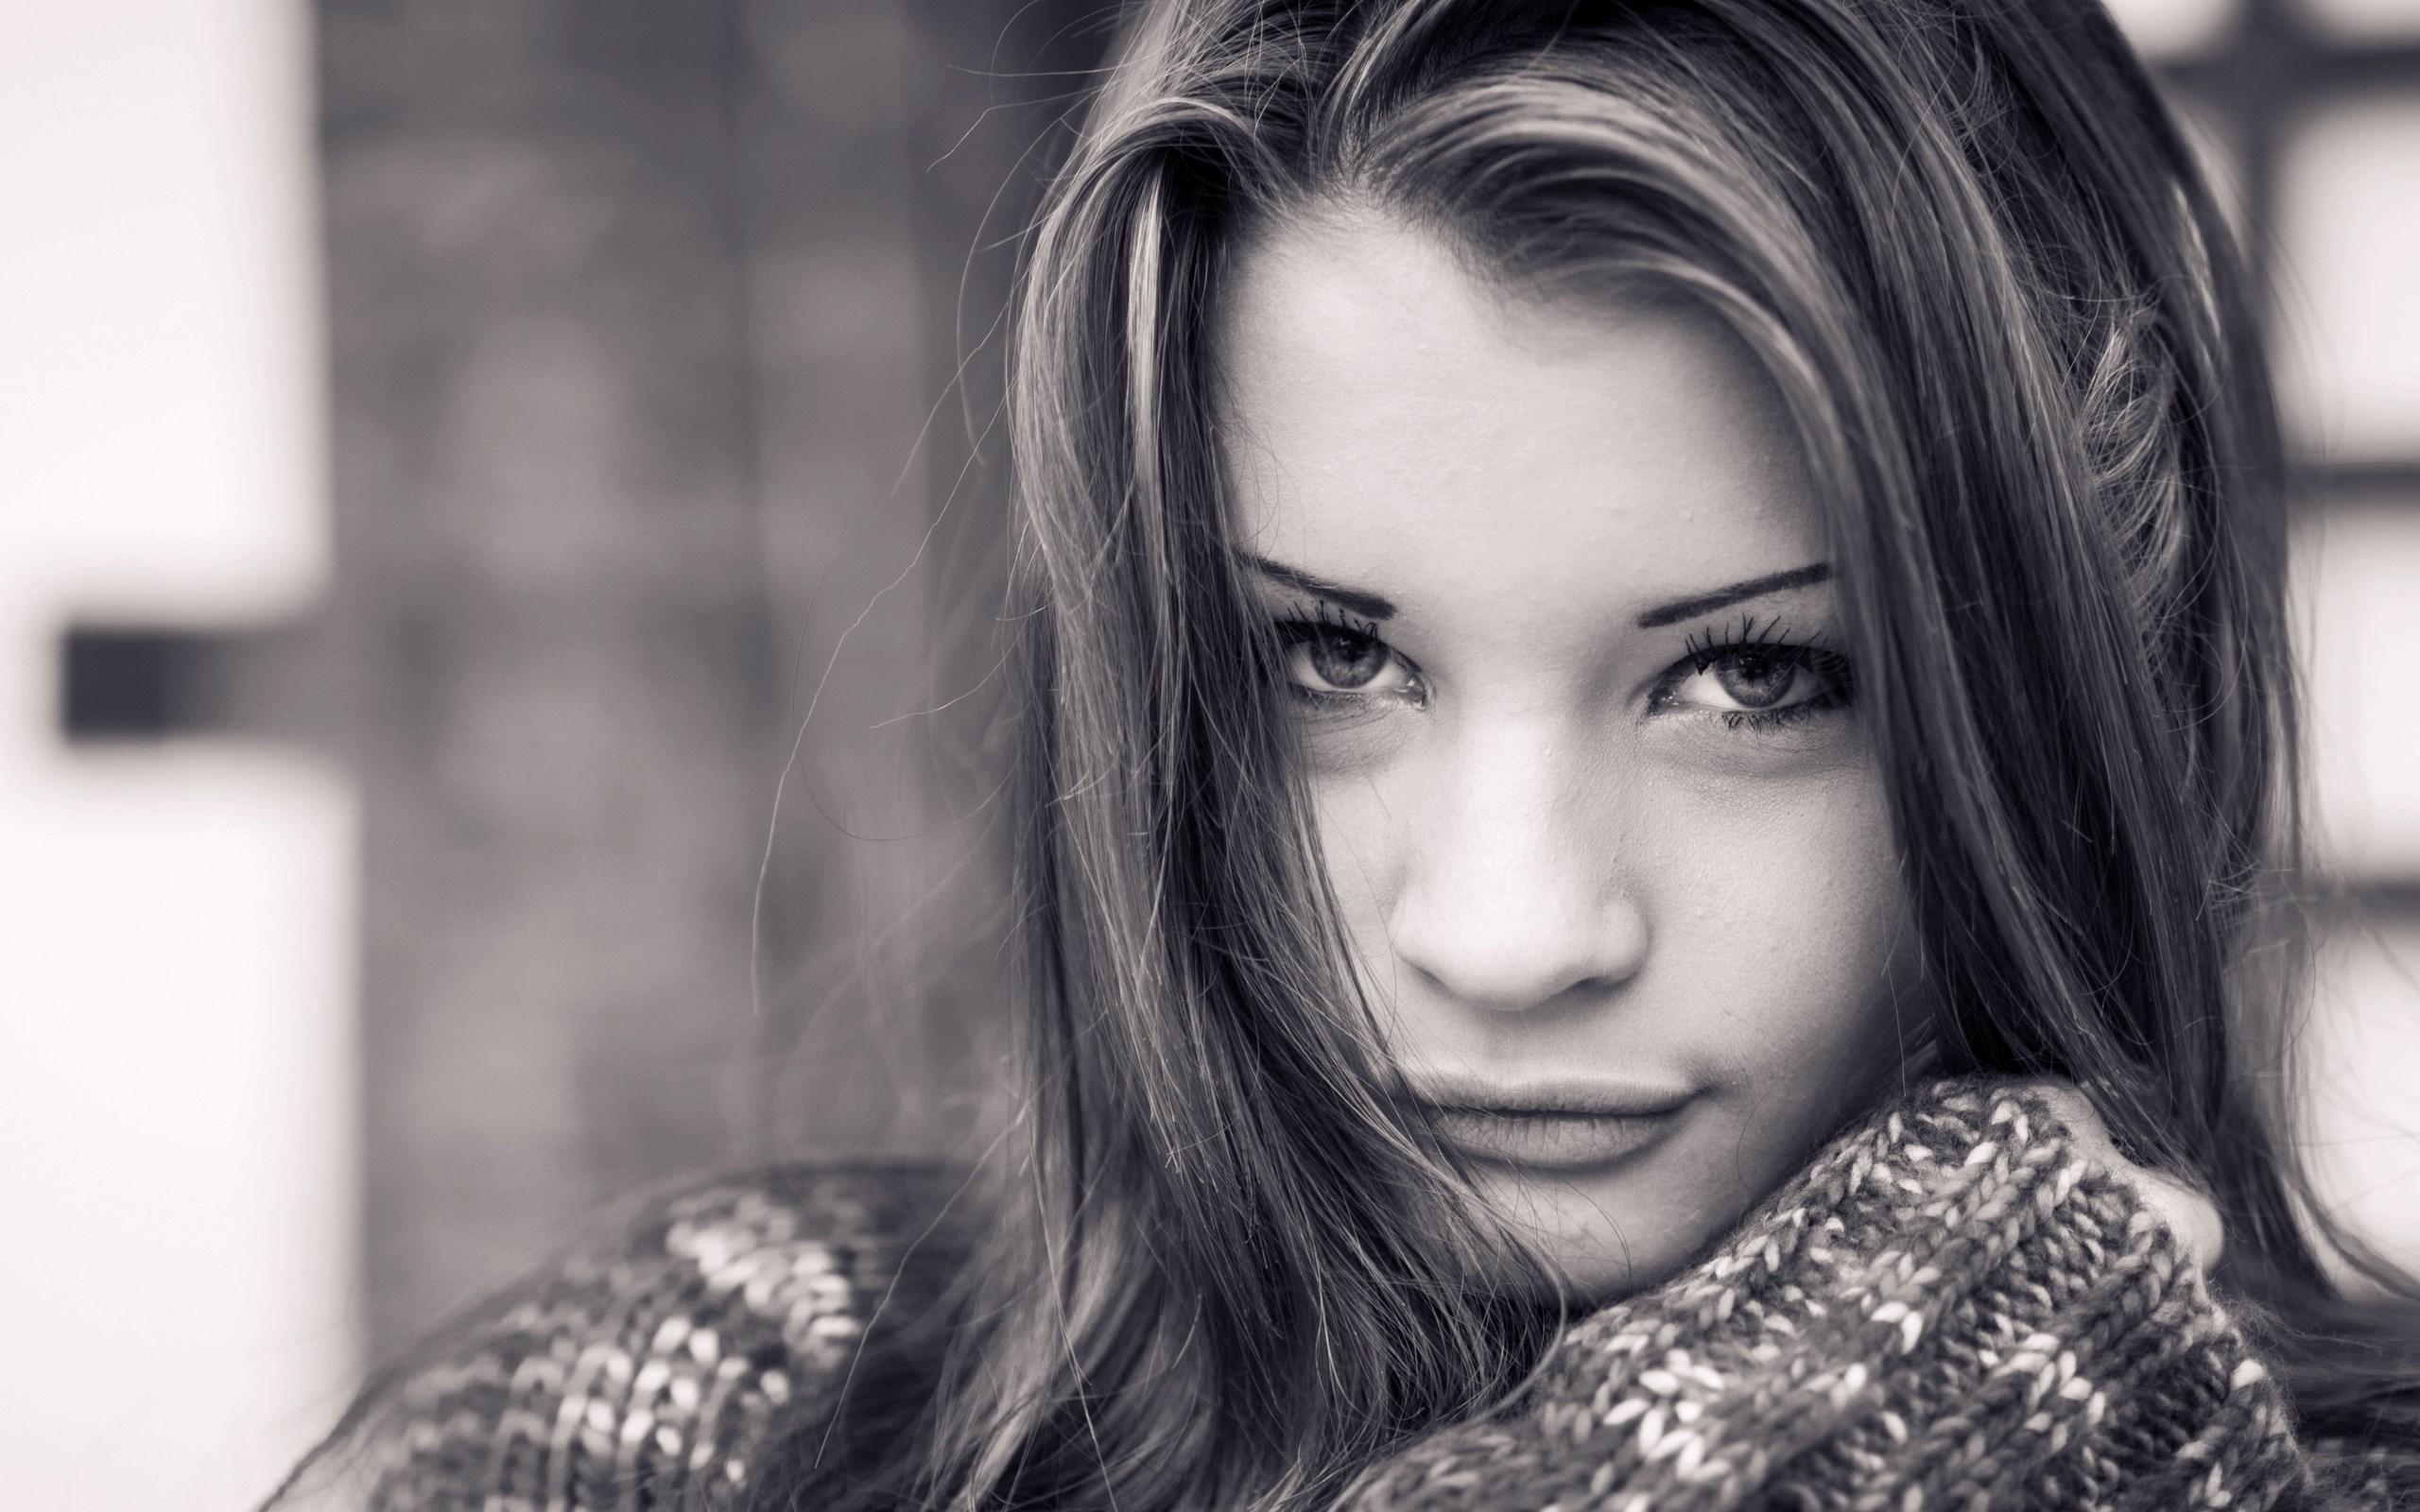 Happy Girl Portrait Photography